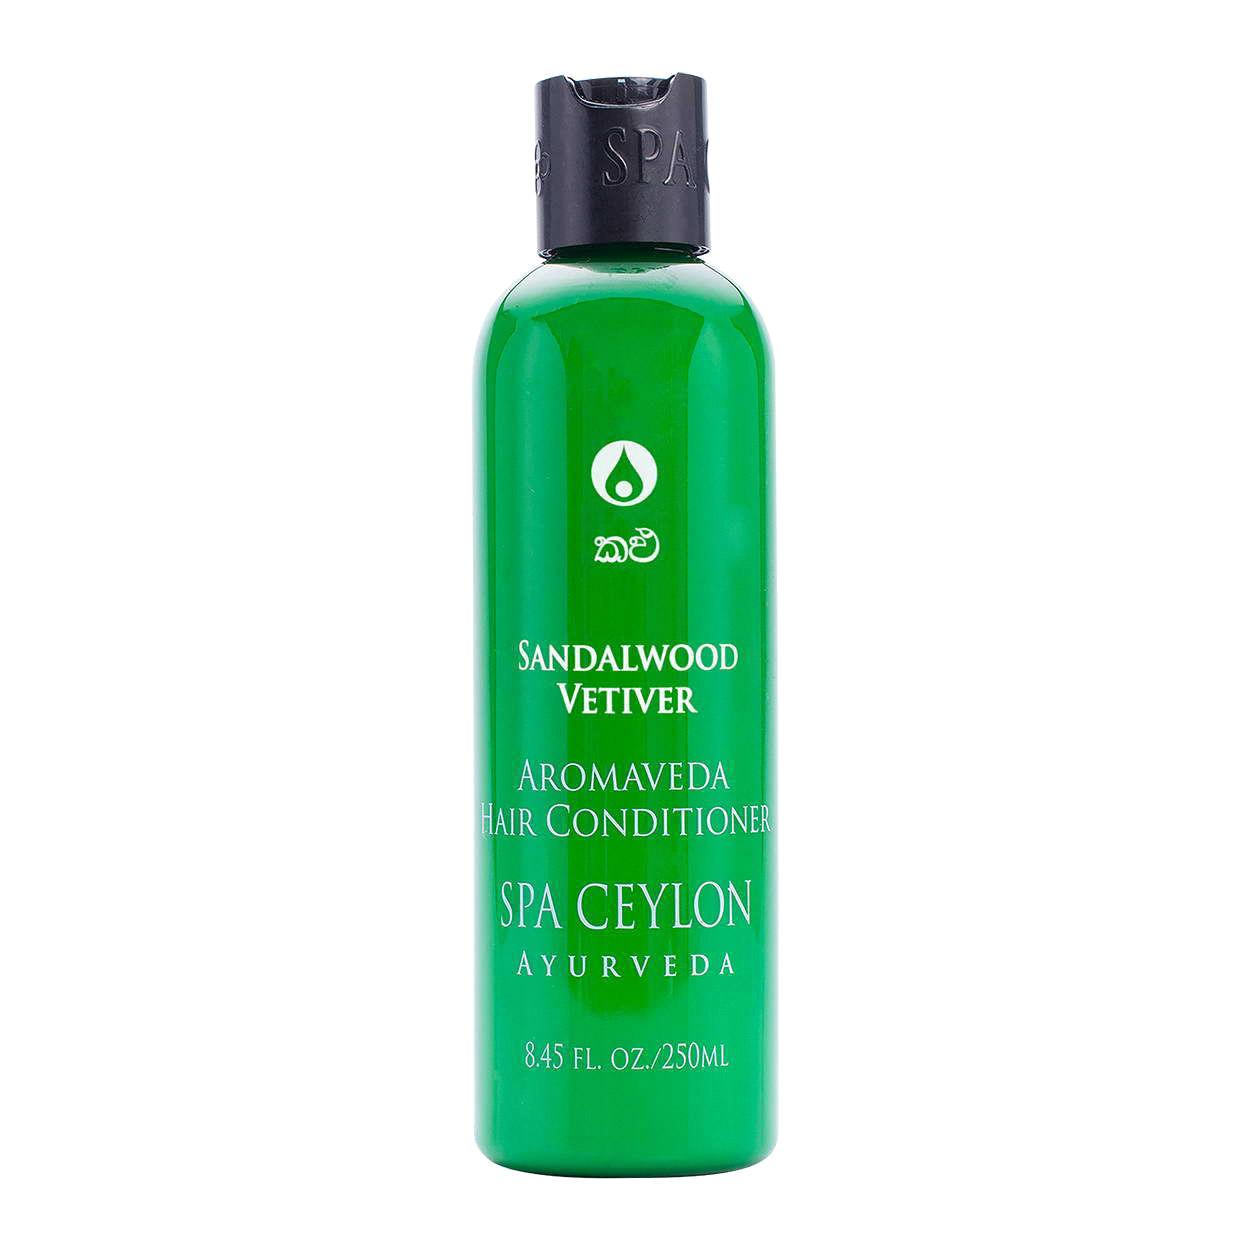 набор spa ceylon ayurveda spa Кондиционер для волос Spa Ceylon Сандал и Ветивер 250 мл